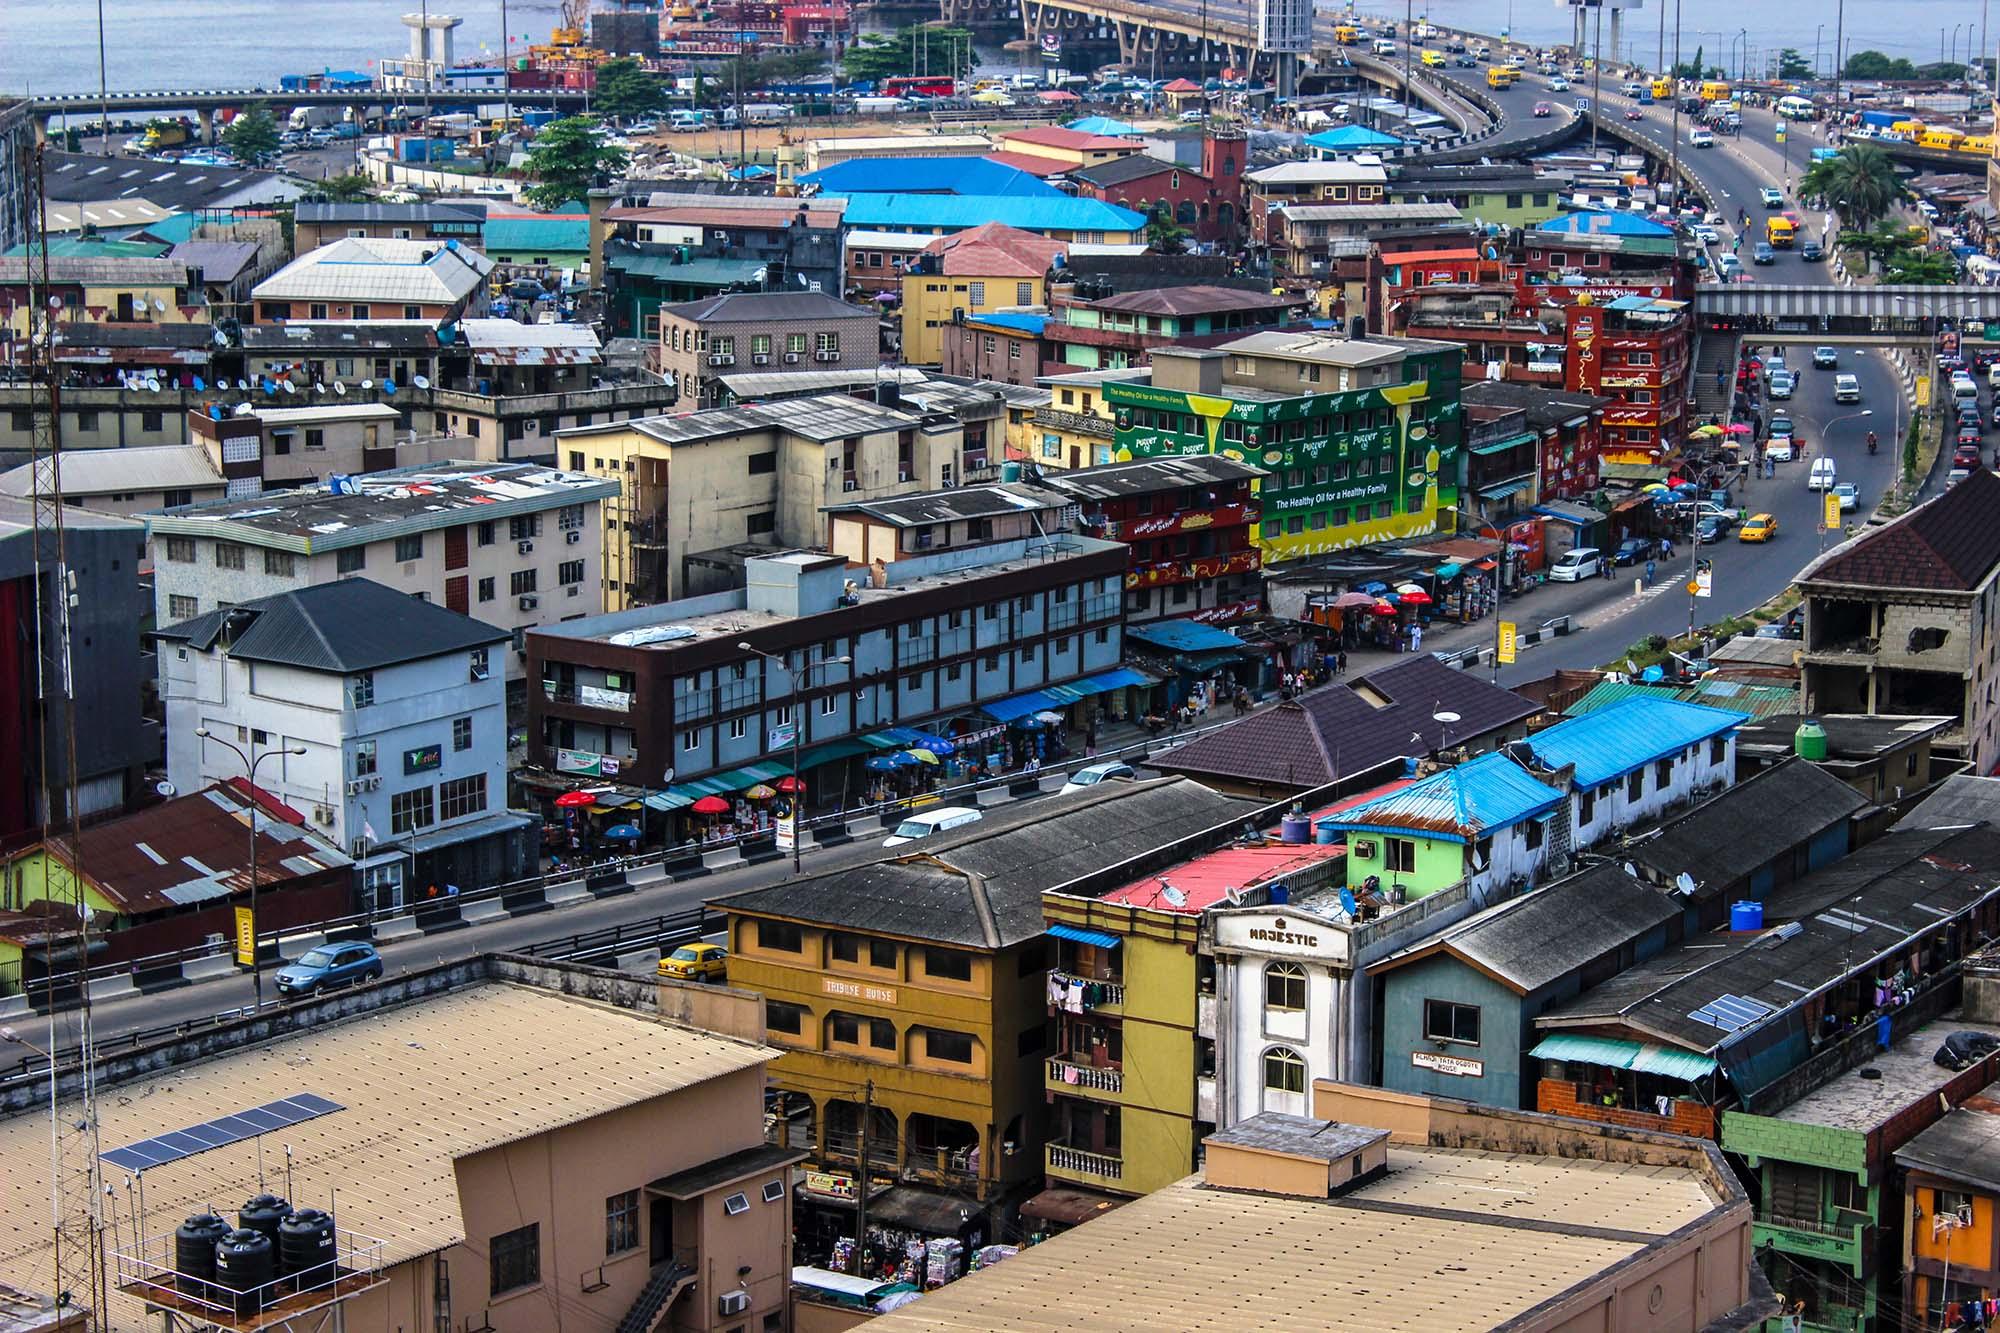 Lagos,,Nigeria,Urban, ,August,17,,2017:,A,Commercial,Urban